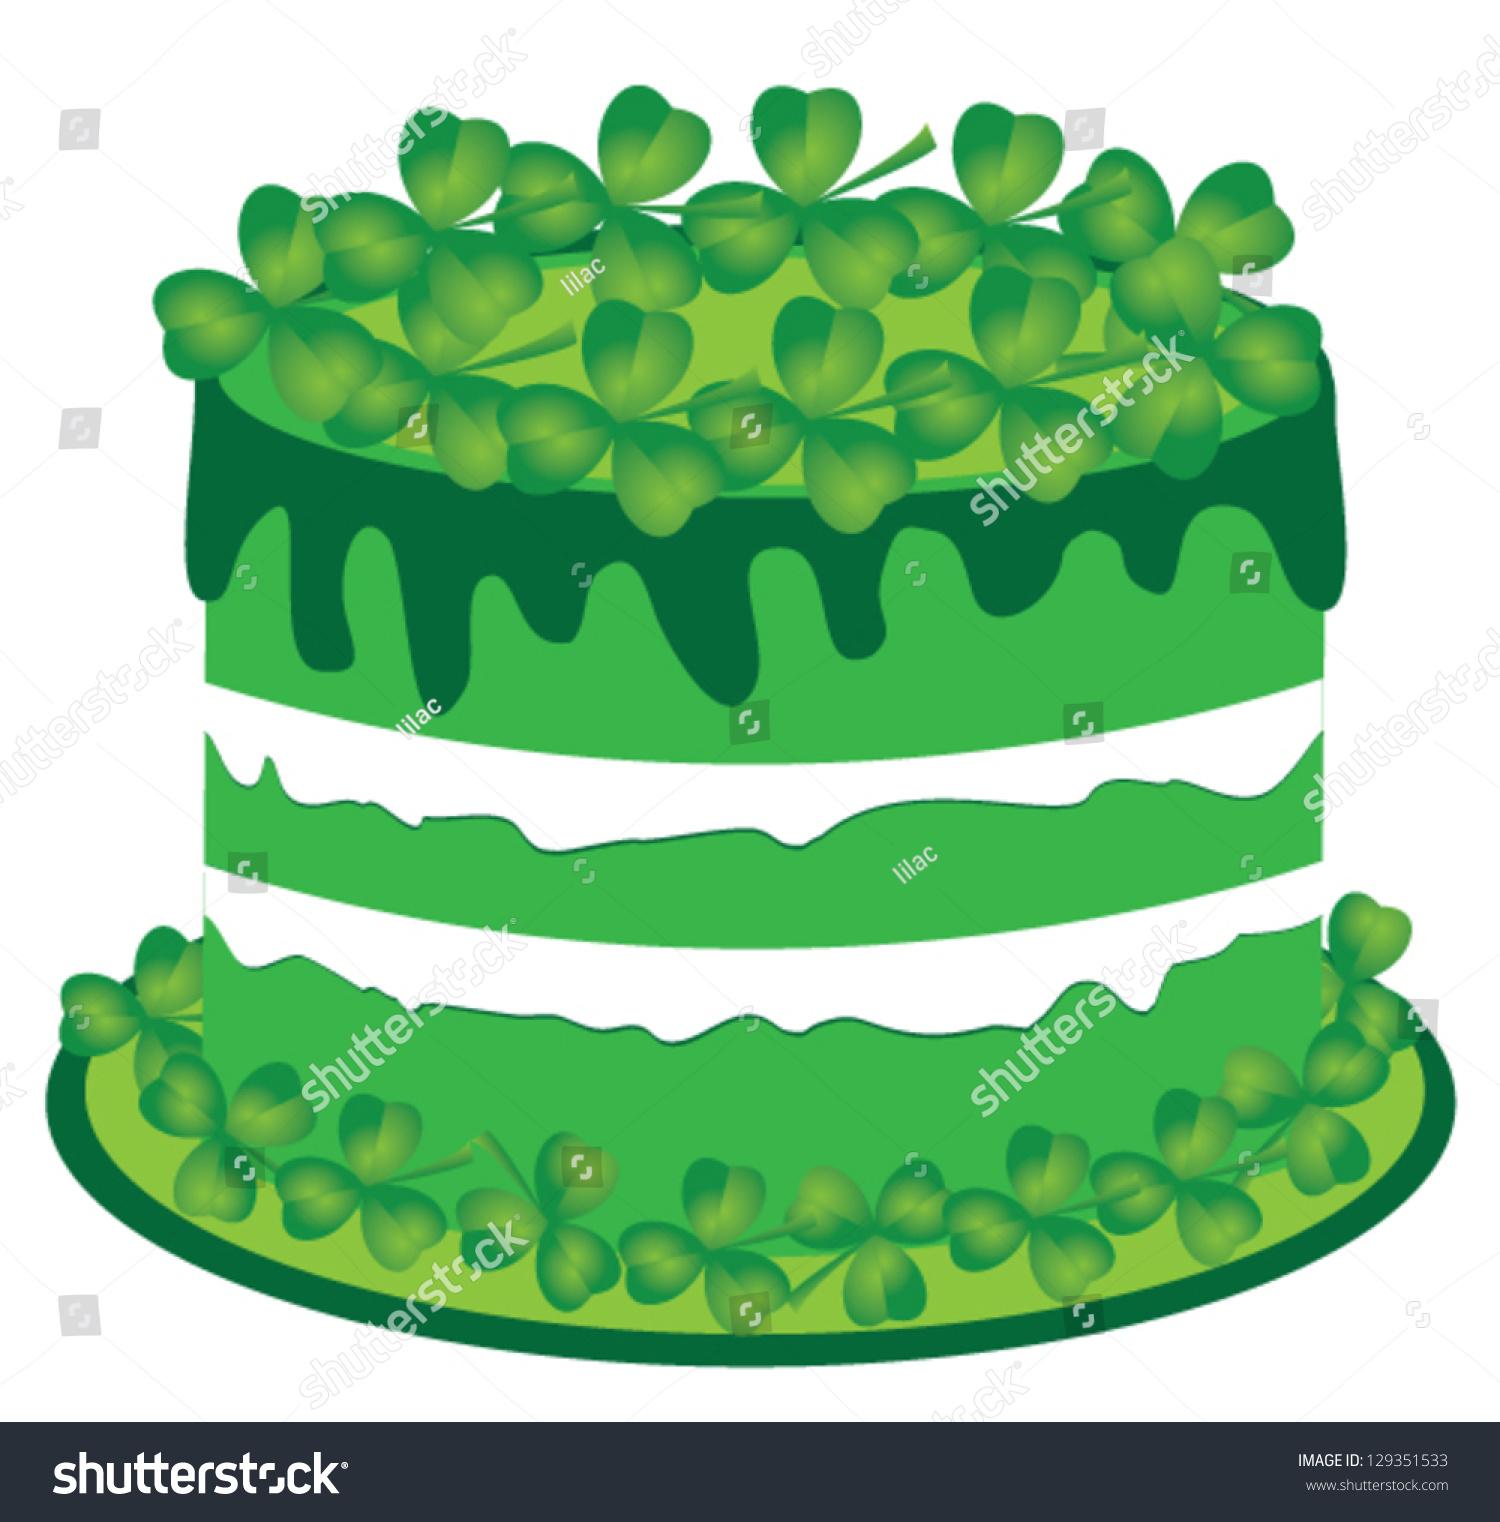 Awe Inspiring Vector Green Cake Shamrock St Valentine Stock Vector Royalty Free Birthday Cards Printable Trancafe Filternl